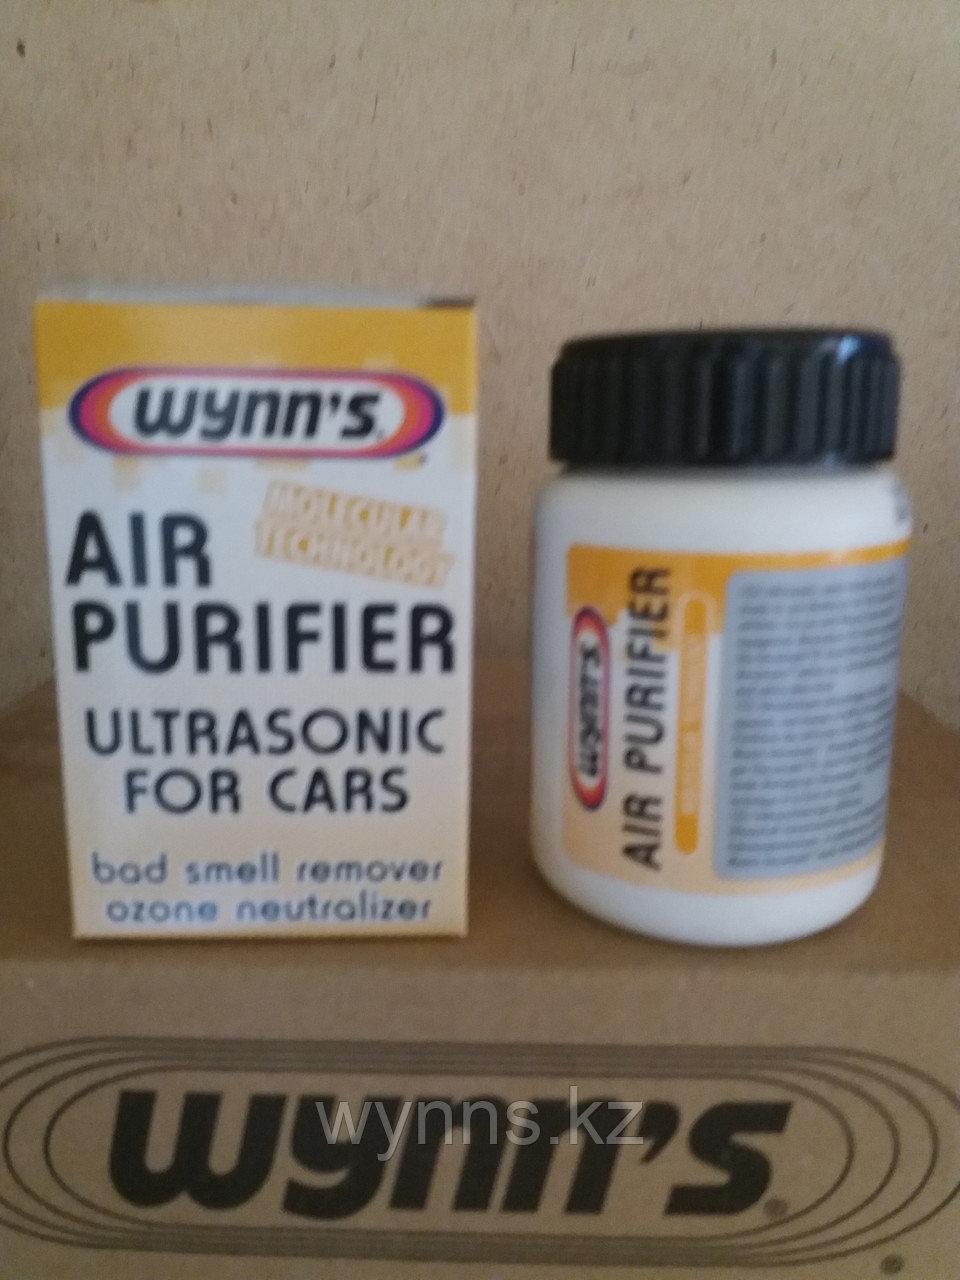 Air Purifier Ultrasonic for cars